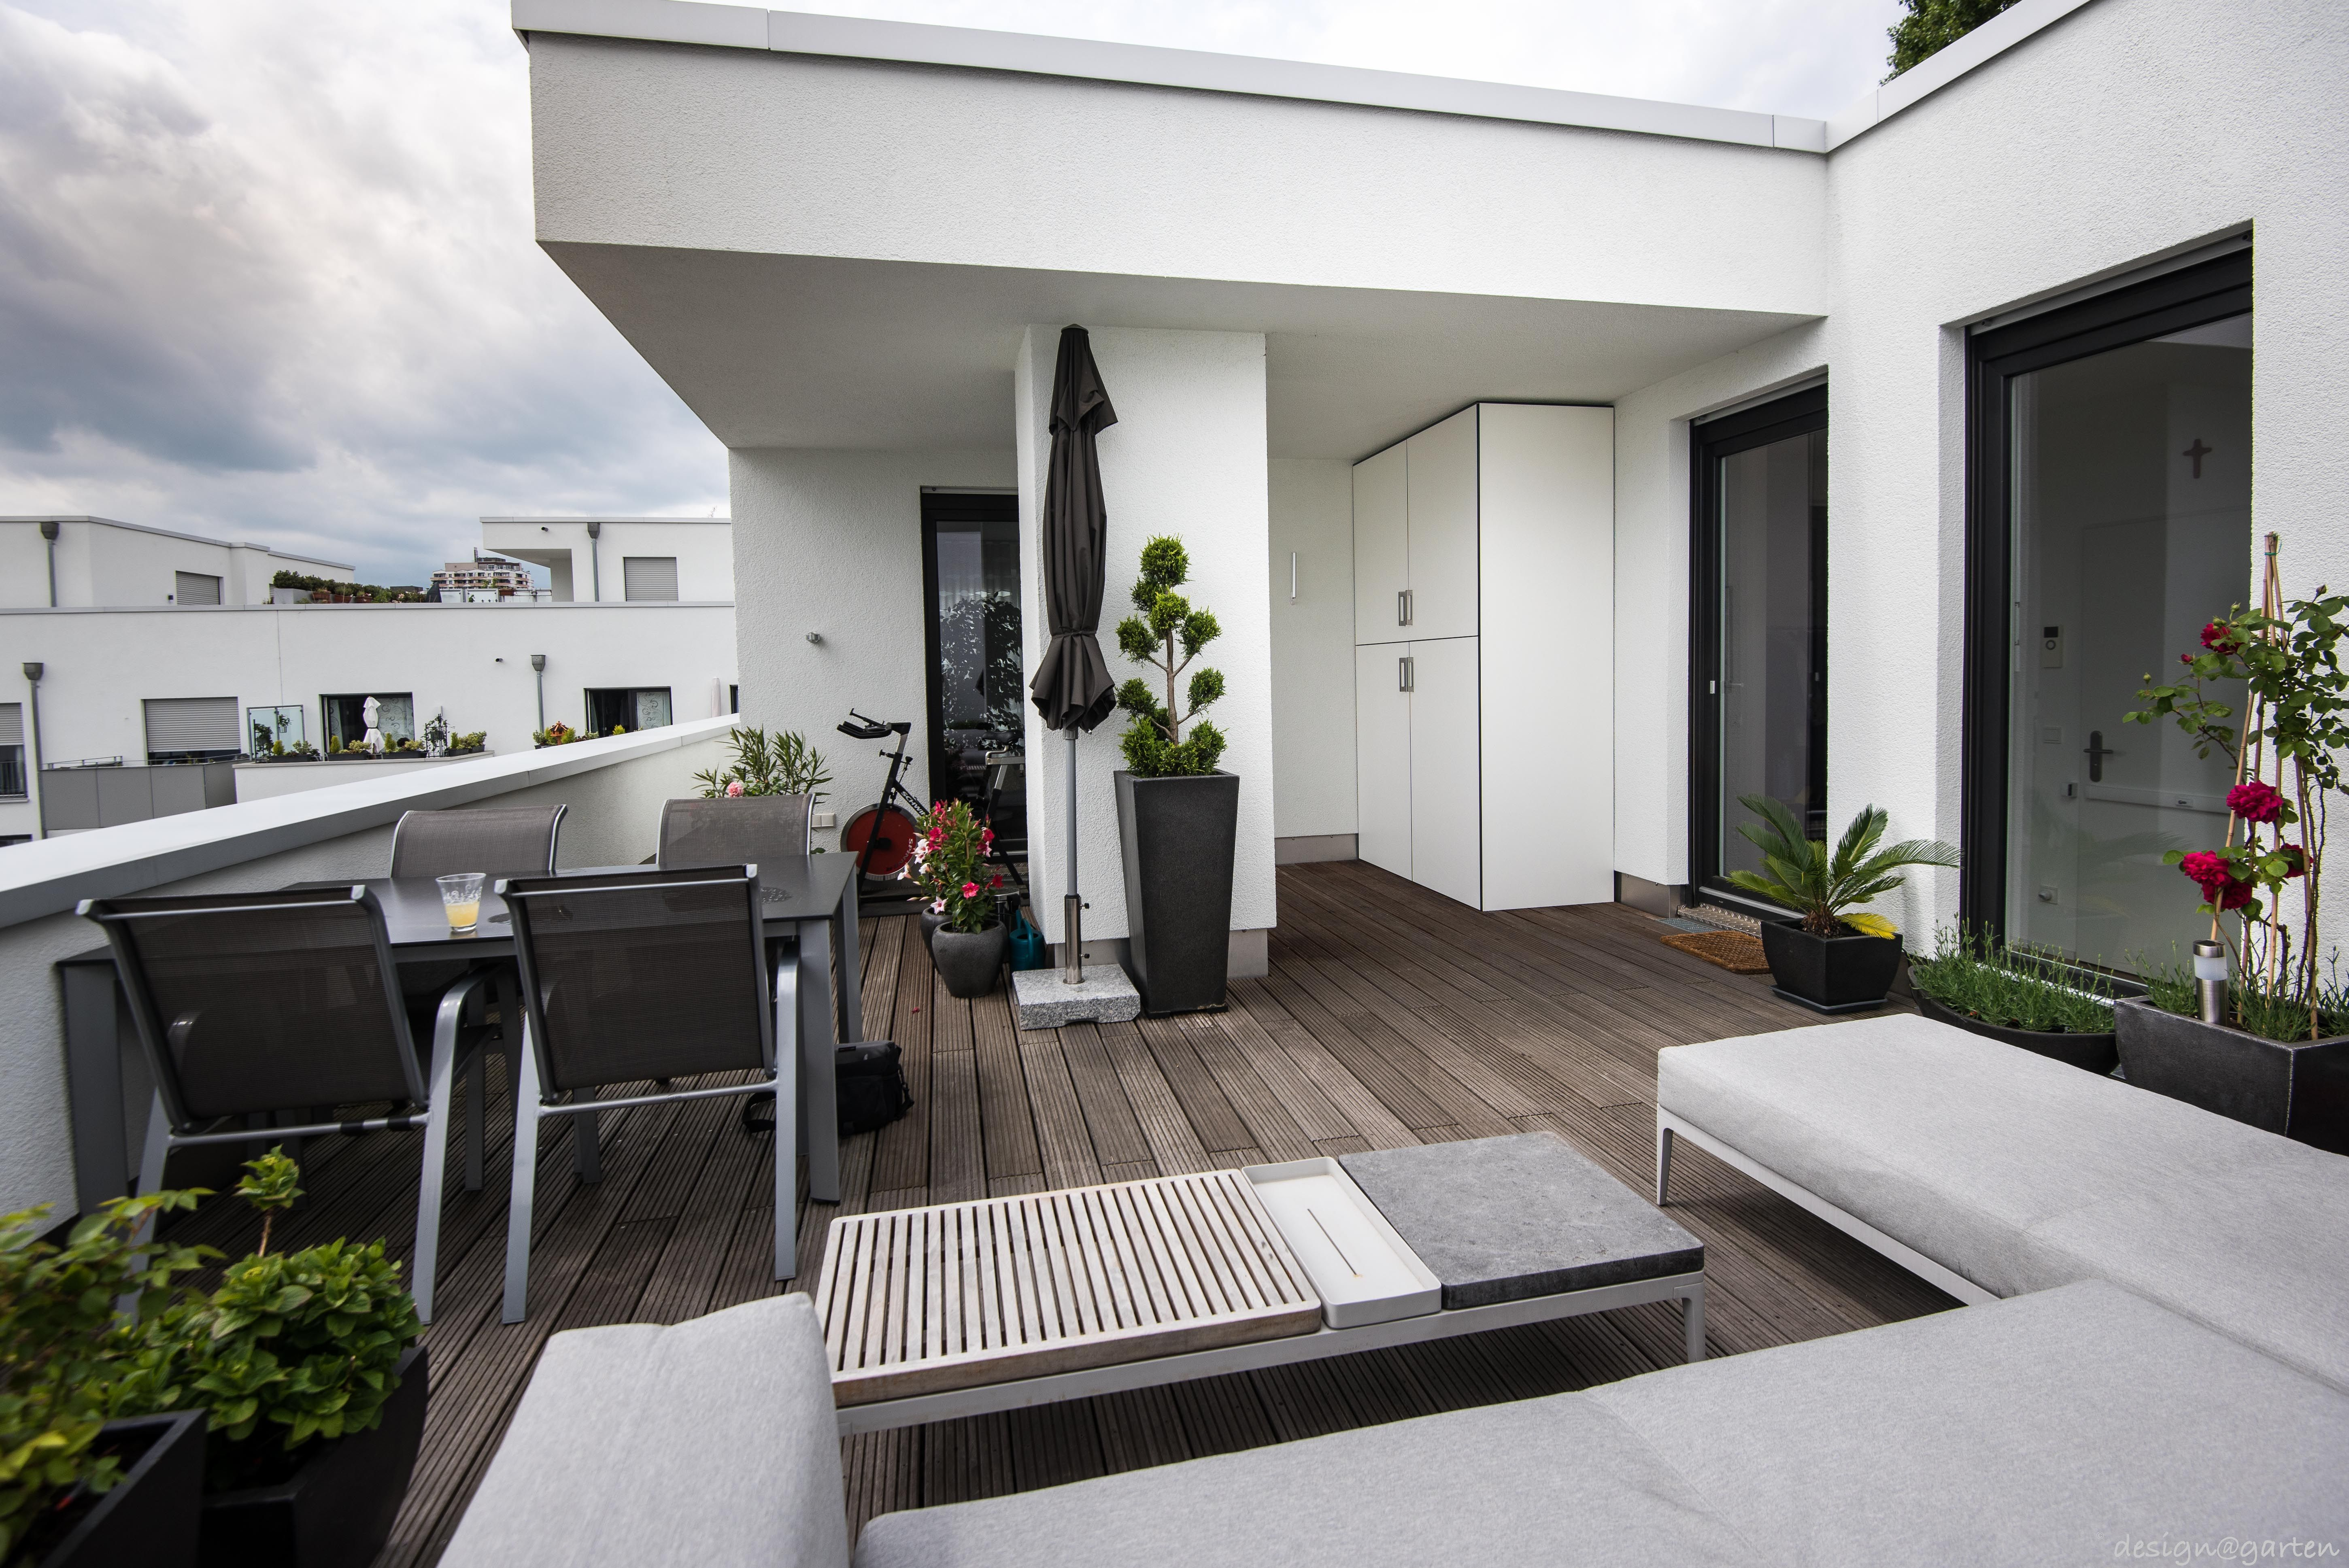 Terrassenschrank Grillschrank Win Projekt In Koln By Design Garten Augsburg Germany Gartenschrank Terassenideen Balkonschrank